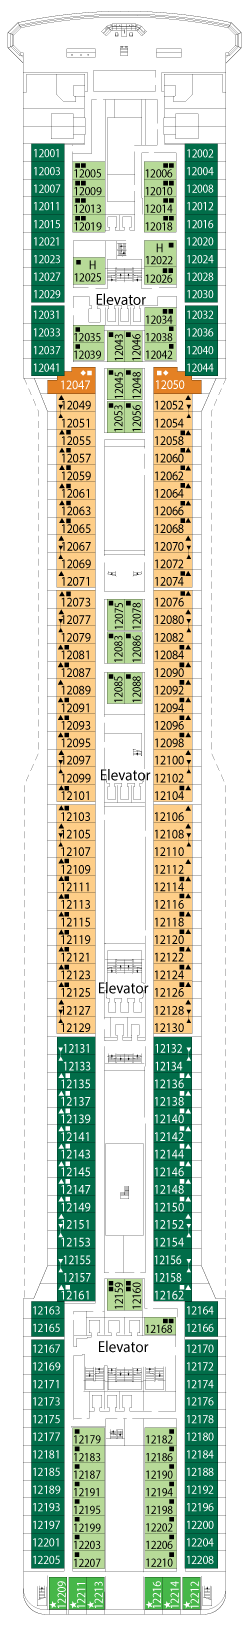 MSC Magnifica Deck 12